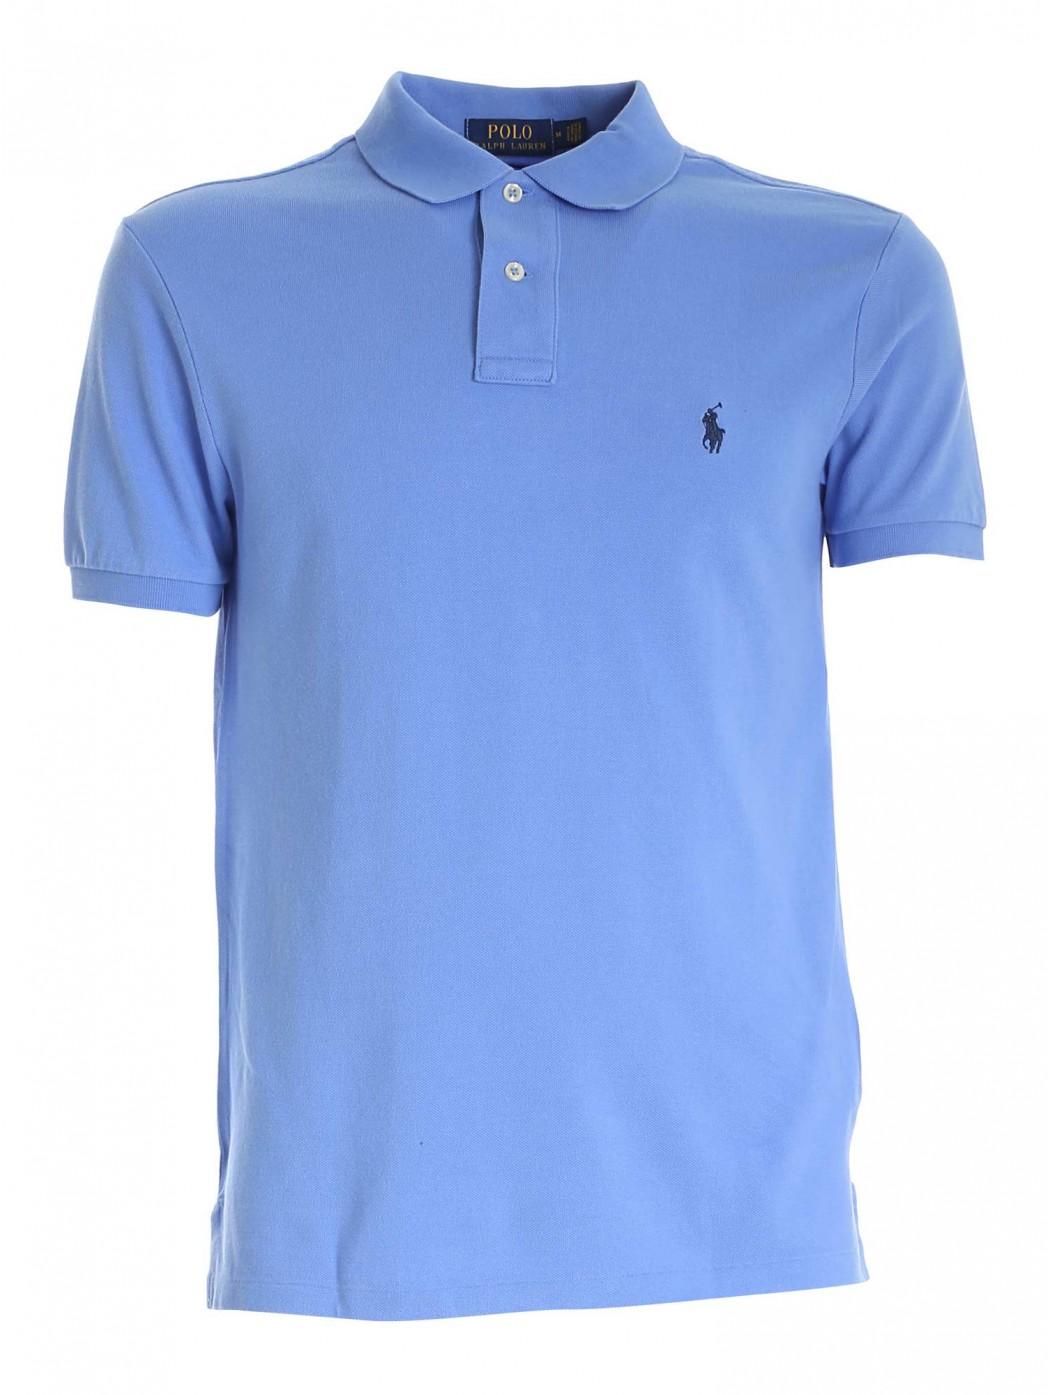 Polo in piqu' Slim-Fit POLO RALPH LAUREN UOMO 710795080 015